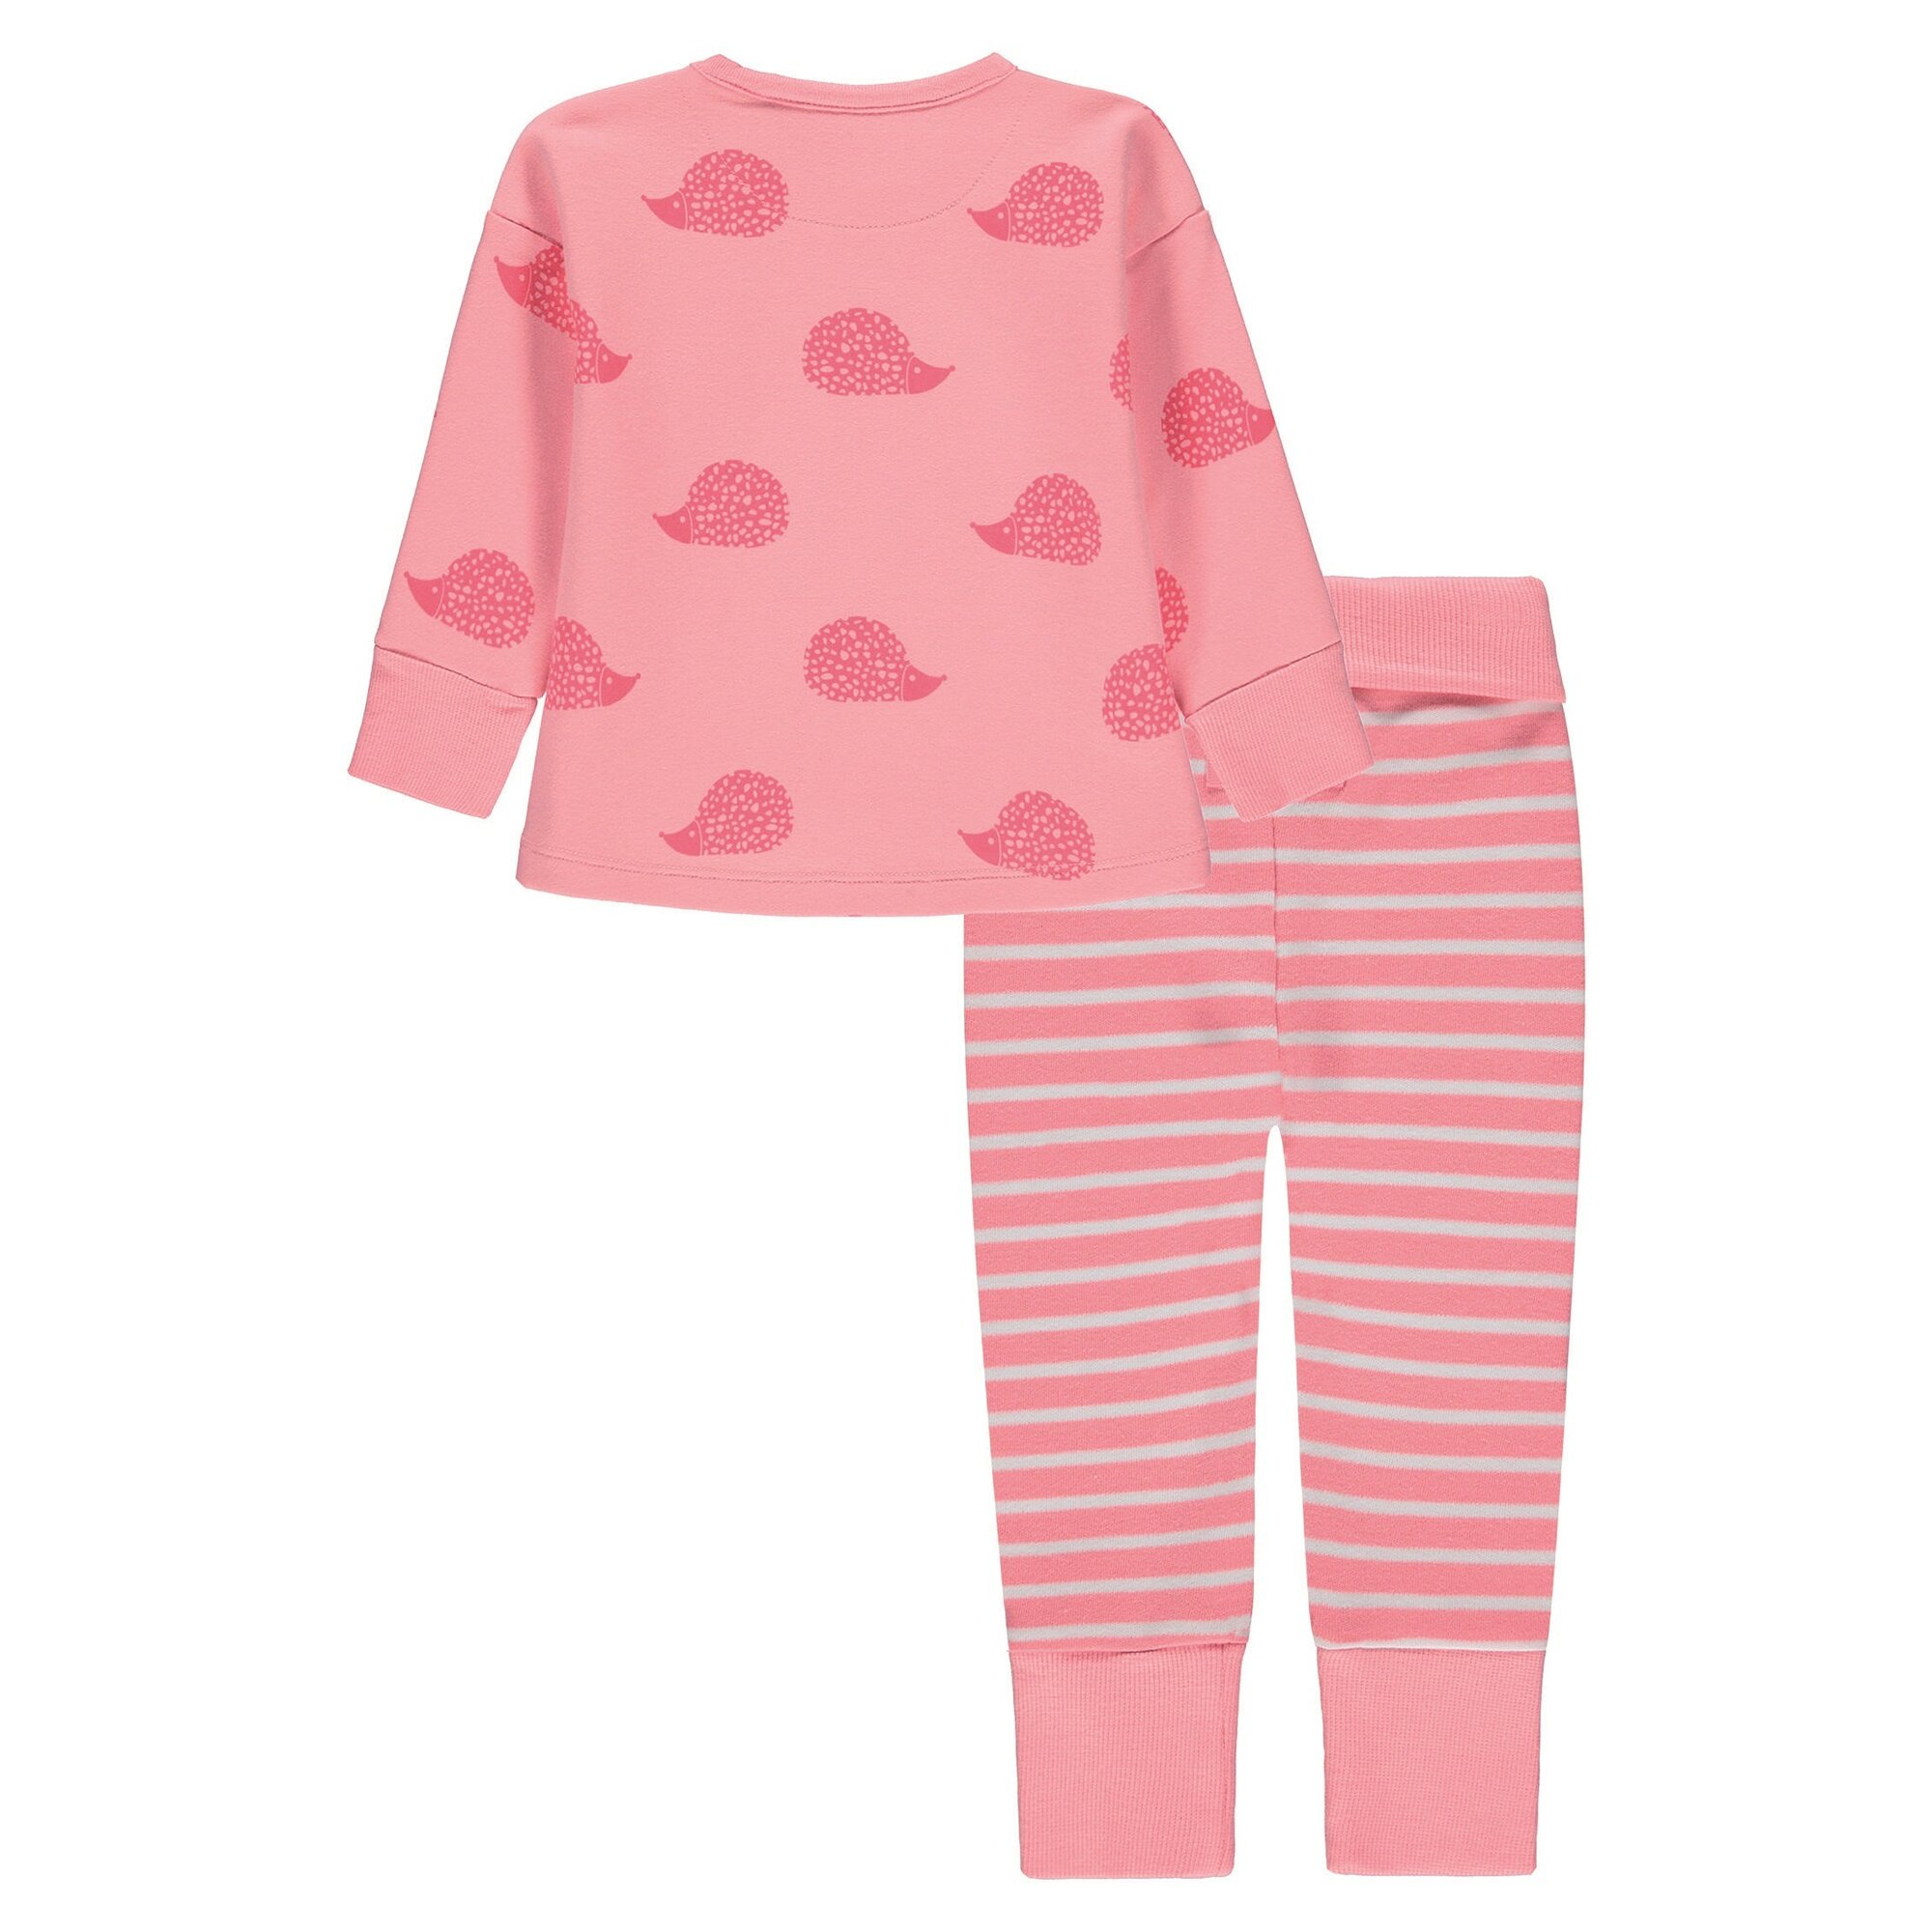 bellybutton-schlafanzug-lang-madchen